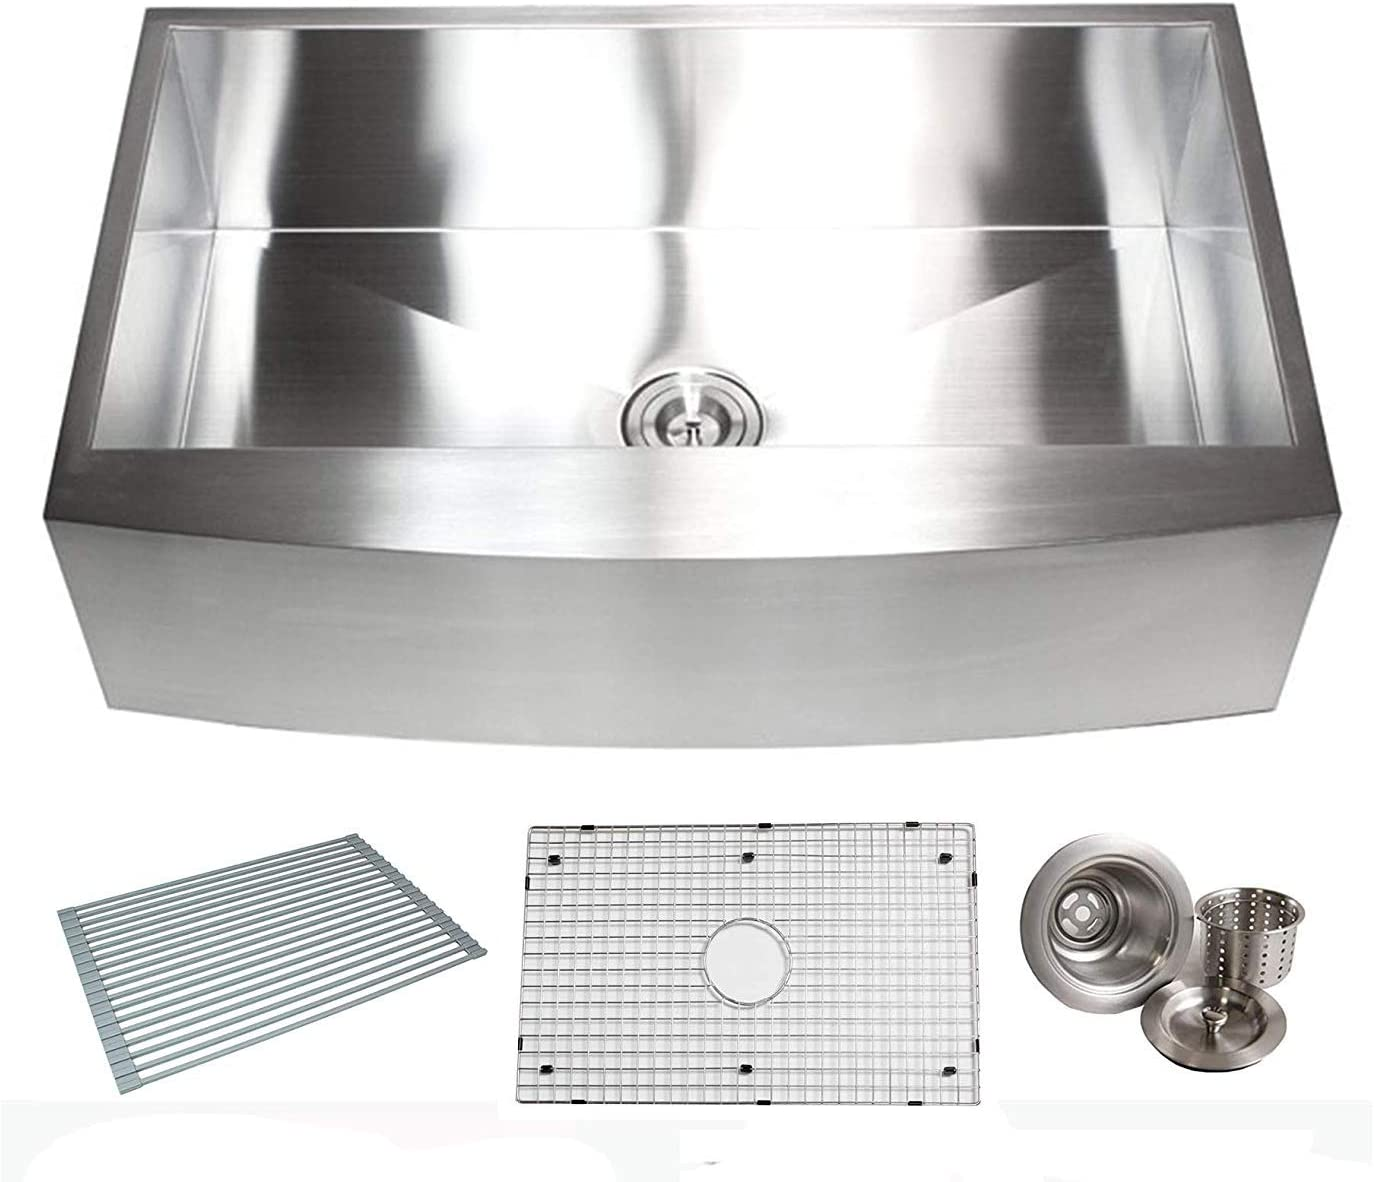 KOHLER K-10412-CP Fort R 4-Hole Sink 9-1 16 spout, Matching Finish sidespray Kitchen Faucet, Polished Chrome